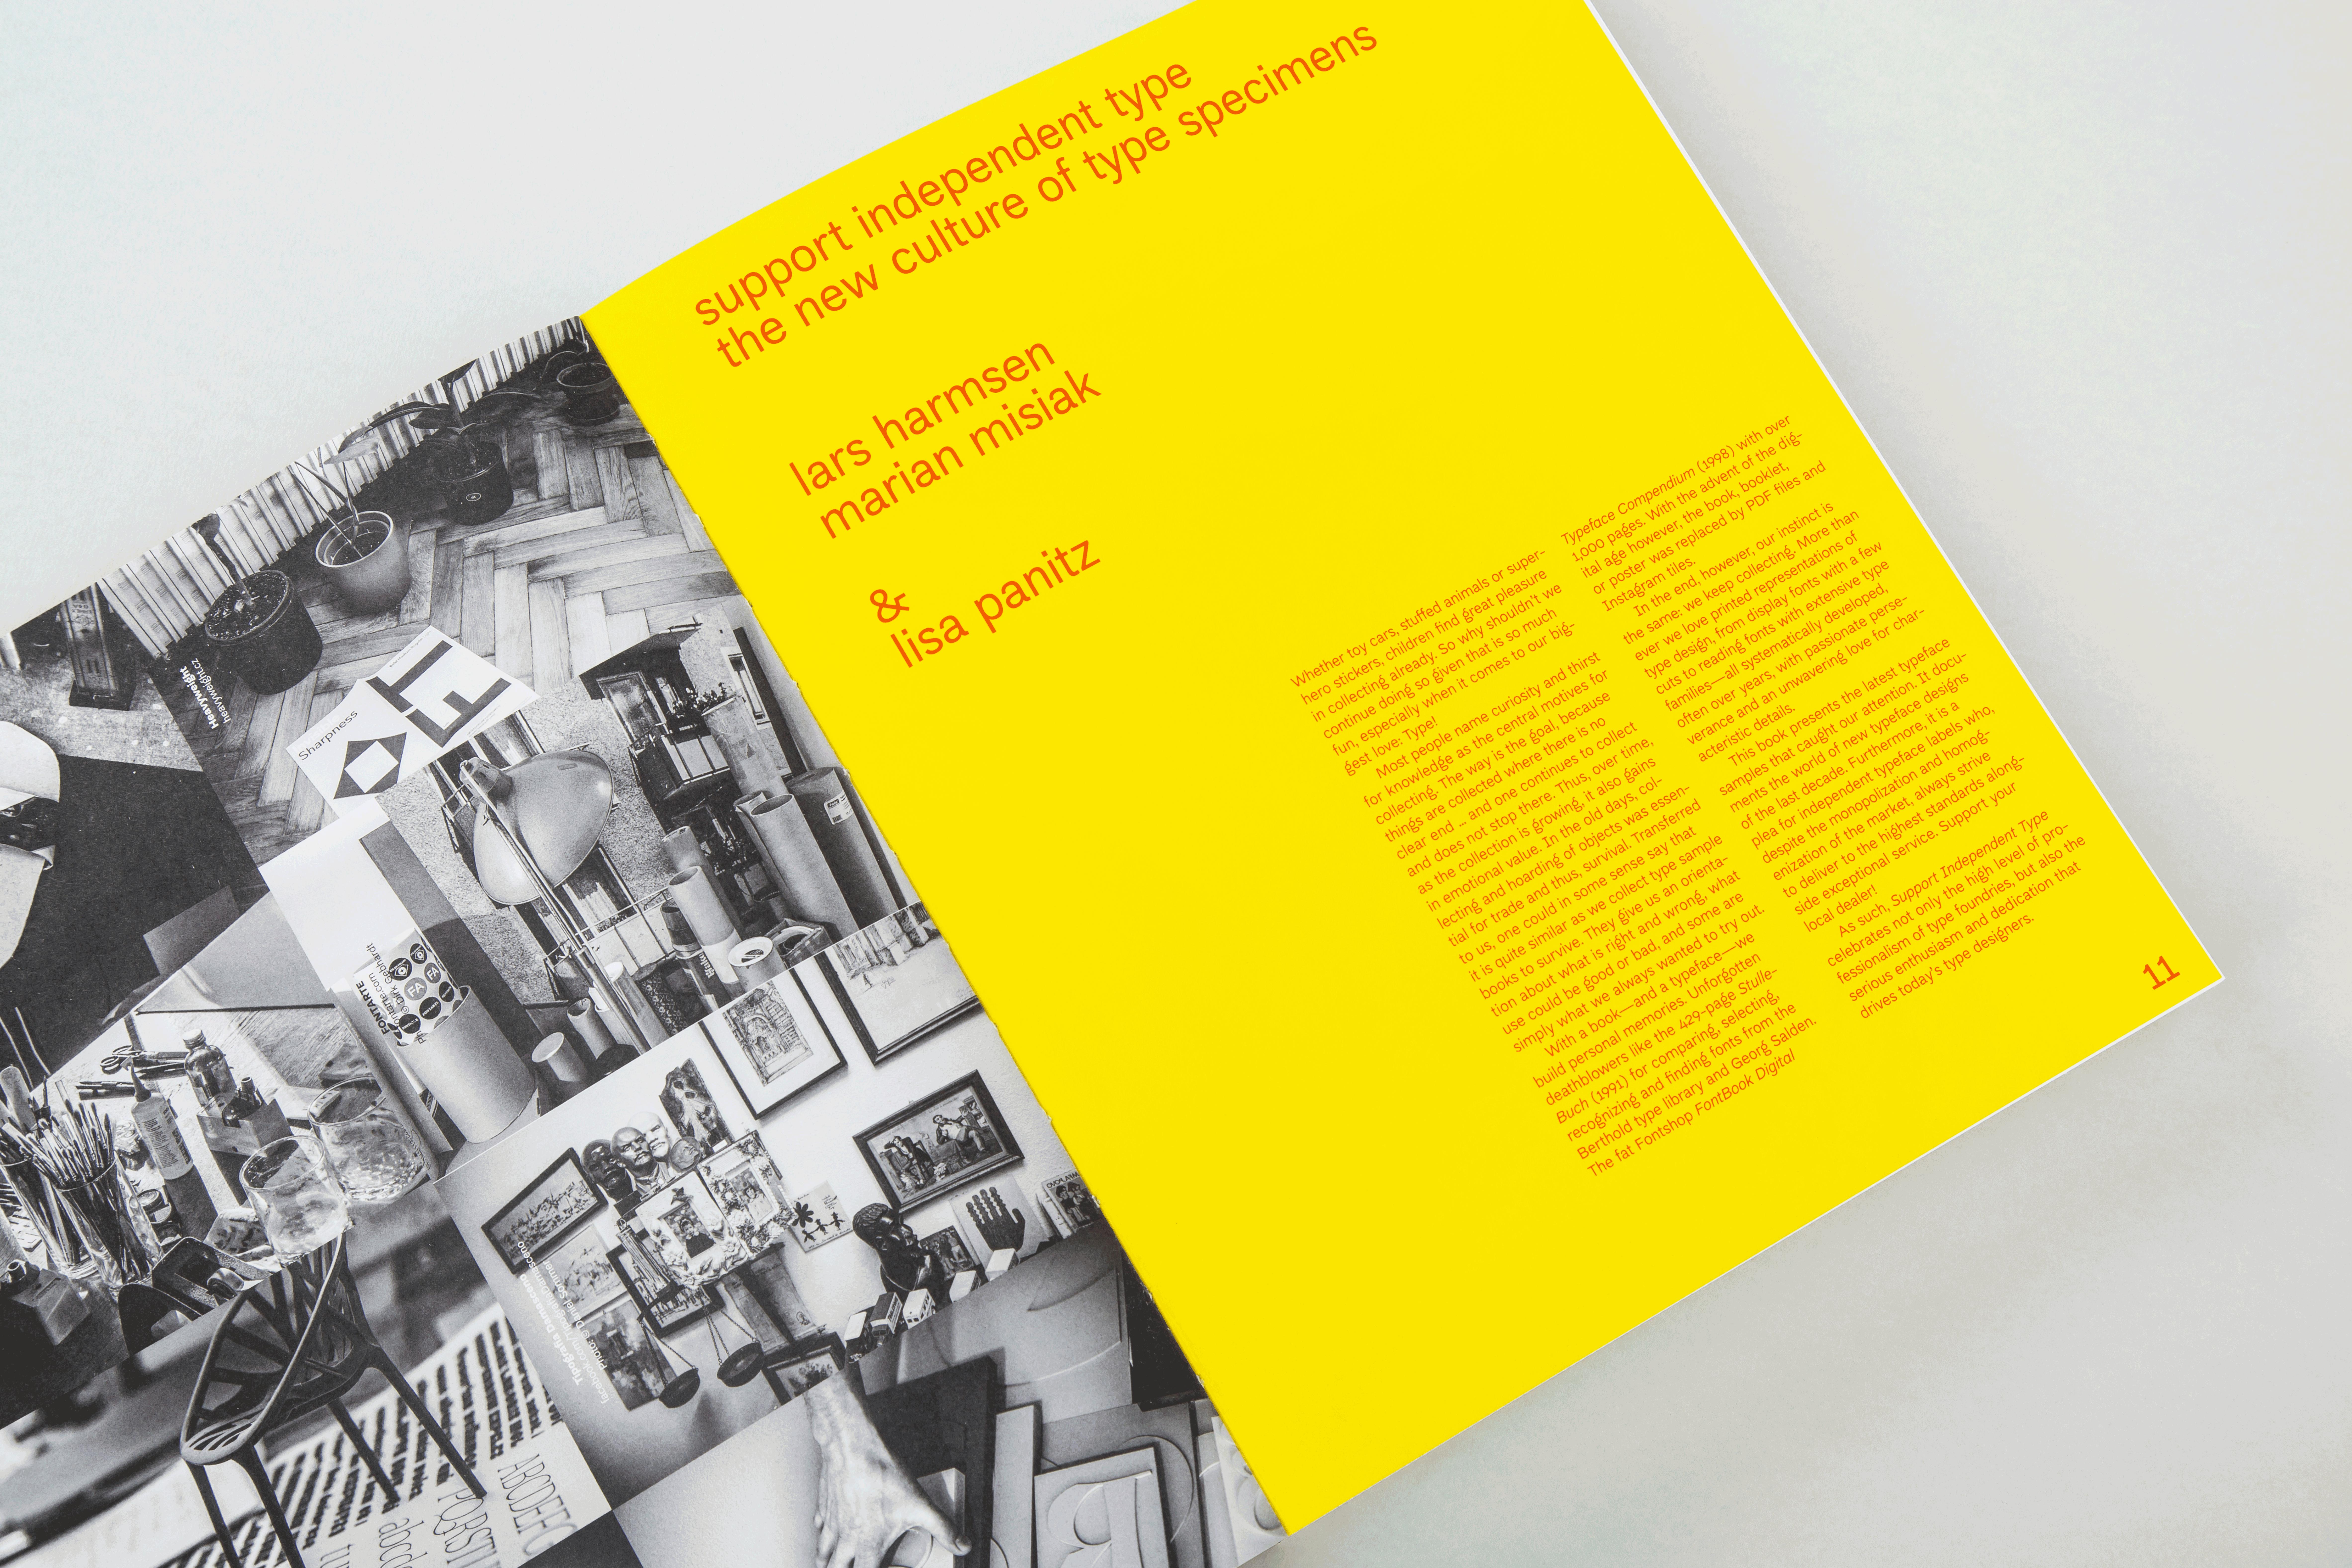 Slanted-Publiaktionen-Slanted-Publishers-Support-Independent-Type_05